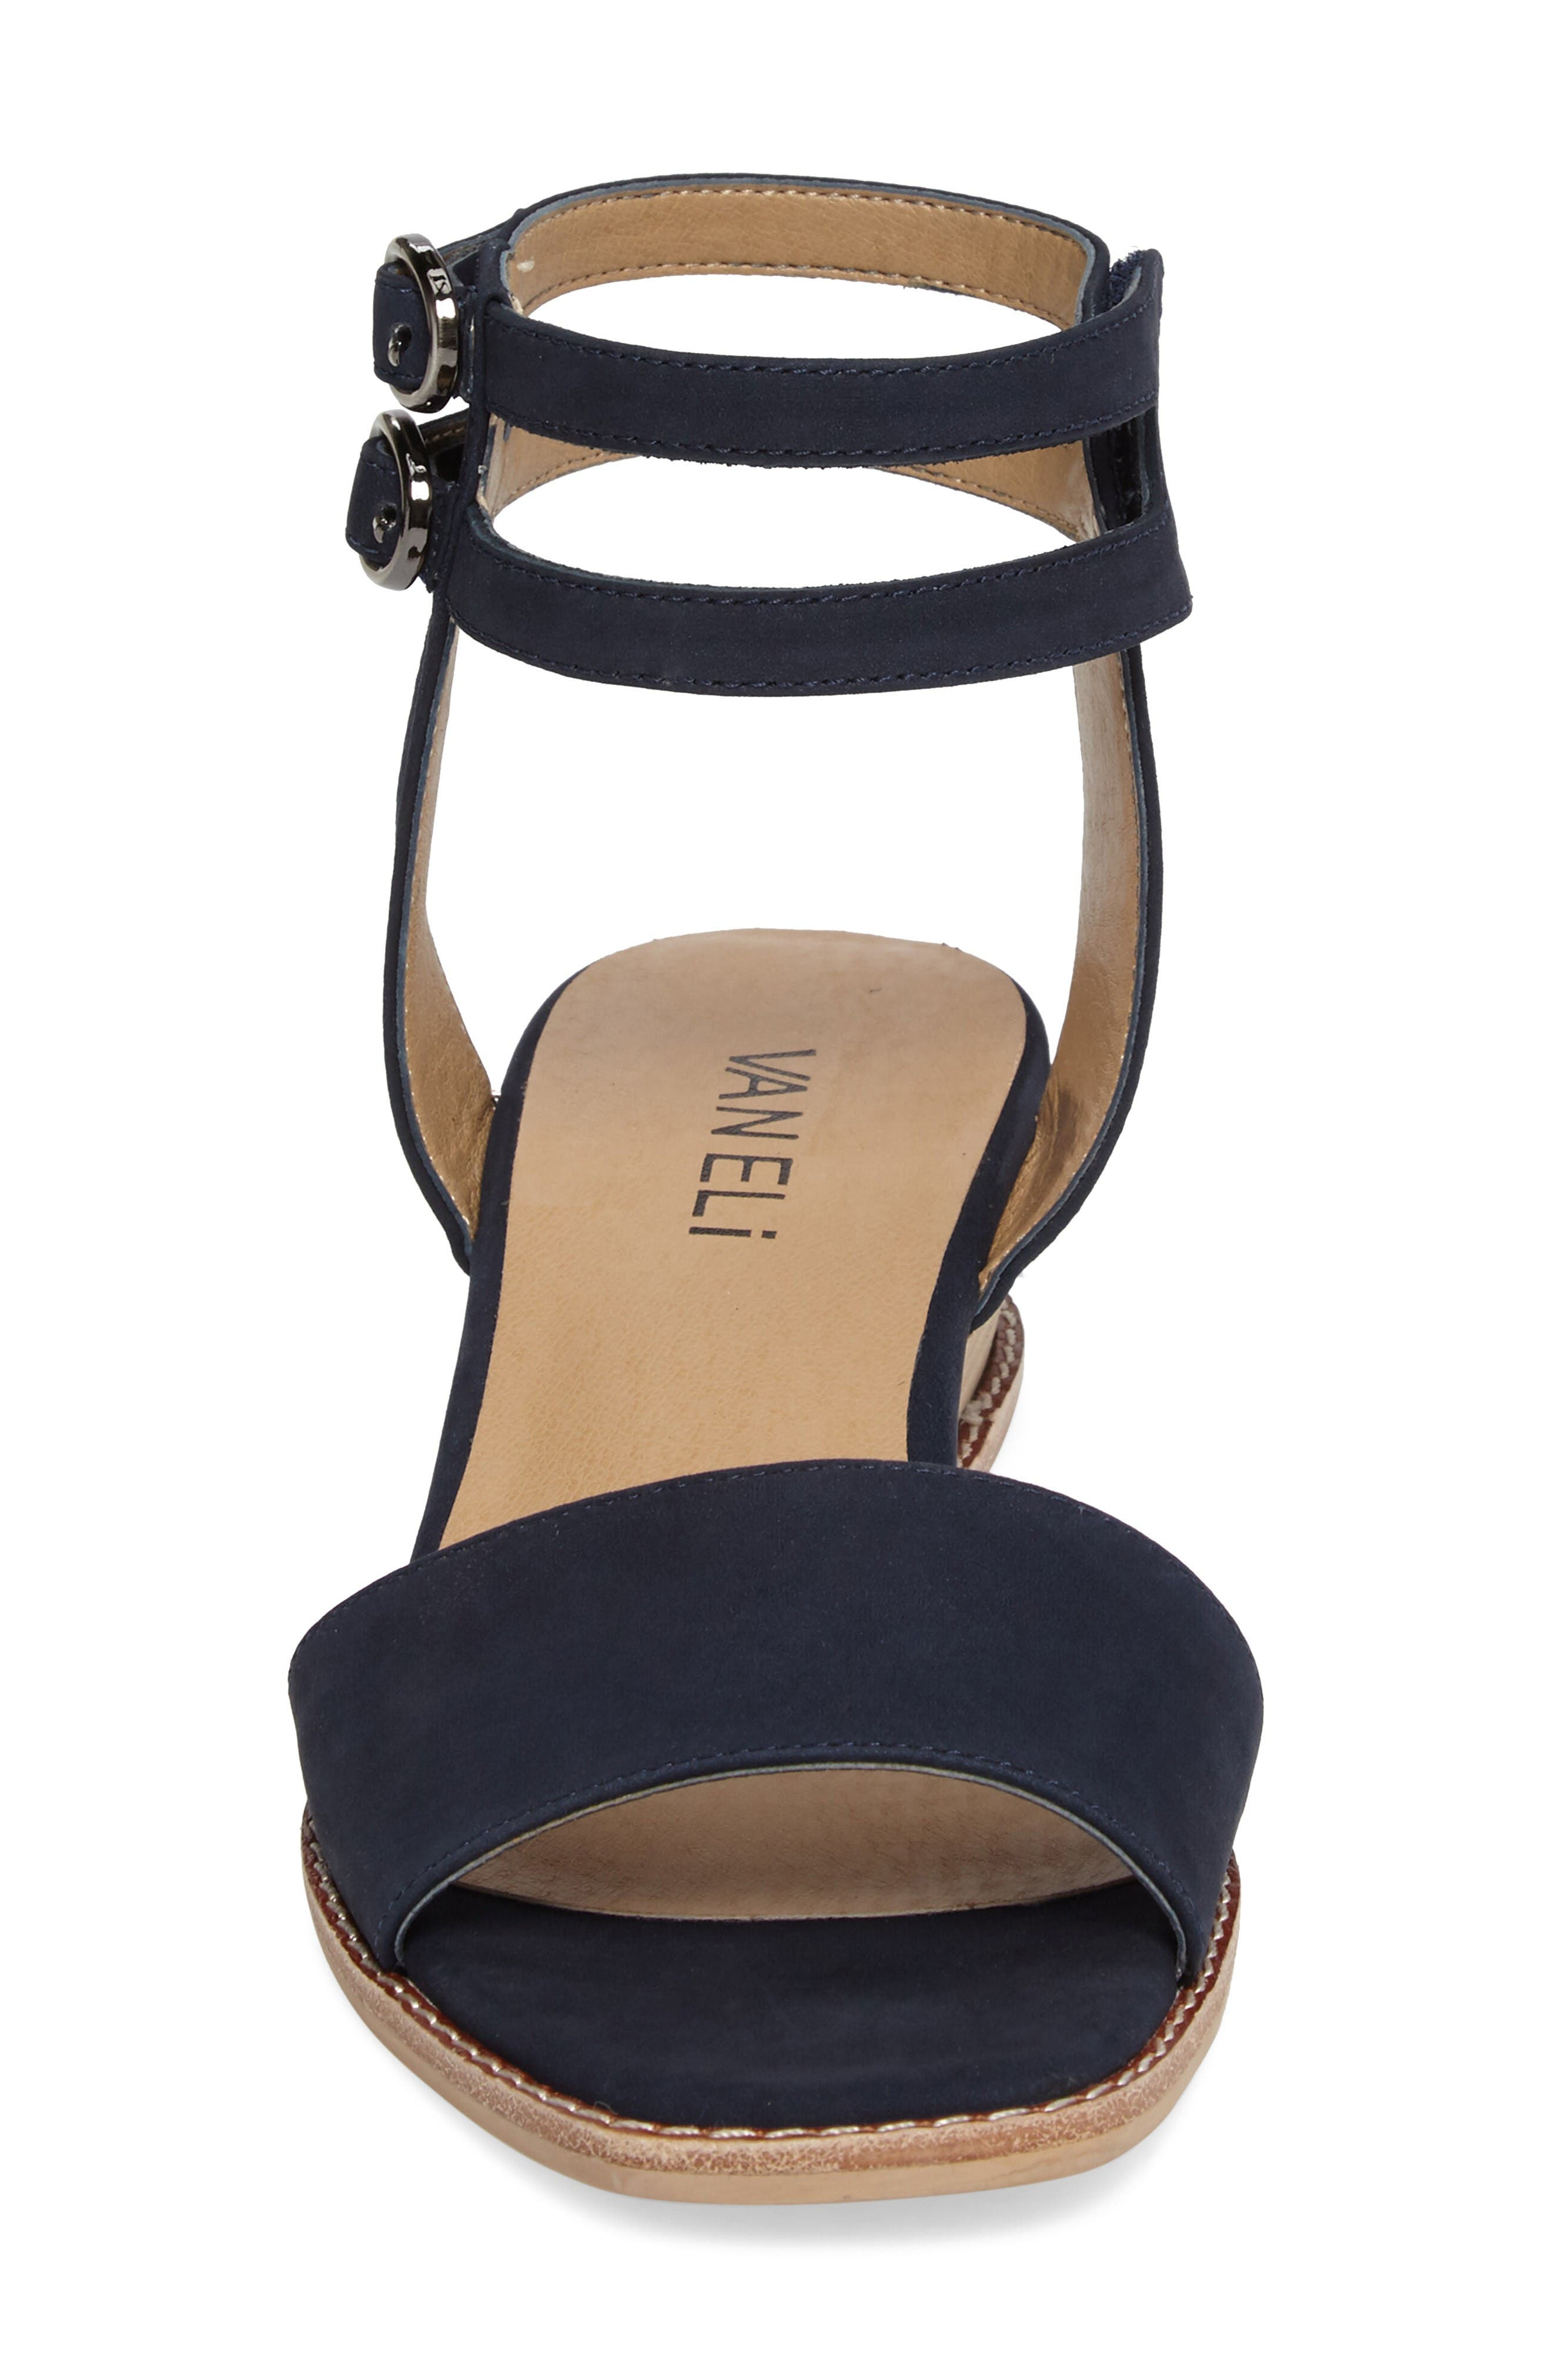 Jarita Ankle Strap Sandal,                             Alternate thumbnail 4, color,                             Navy Leather